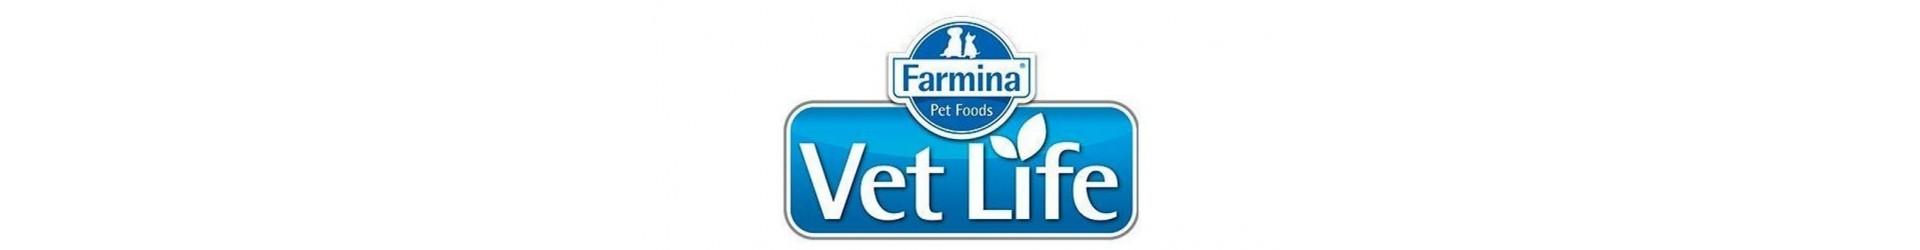 Farmina Vet Life Perros